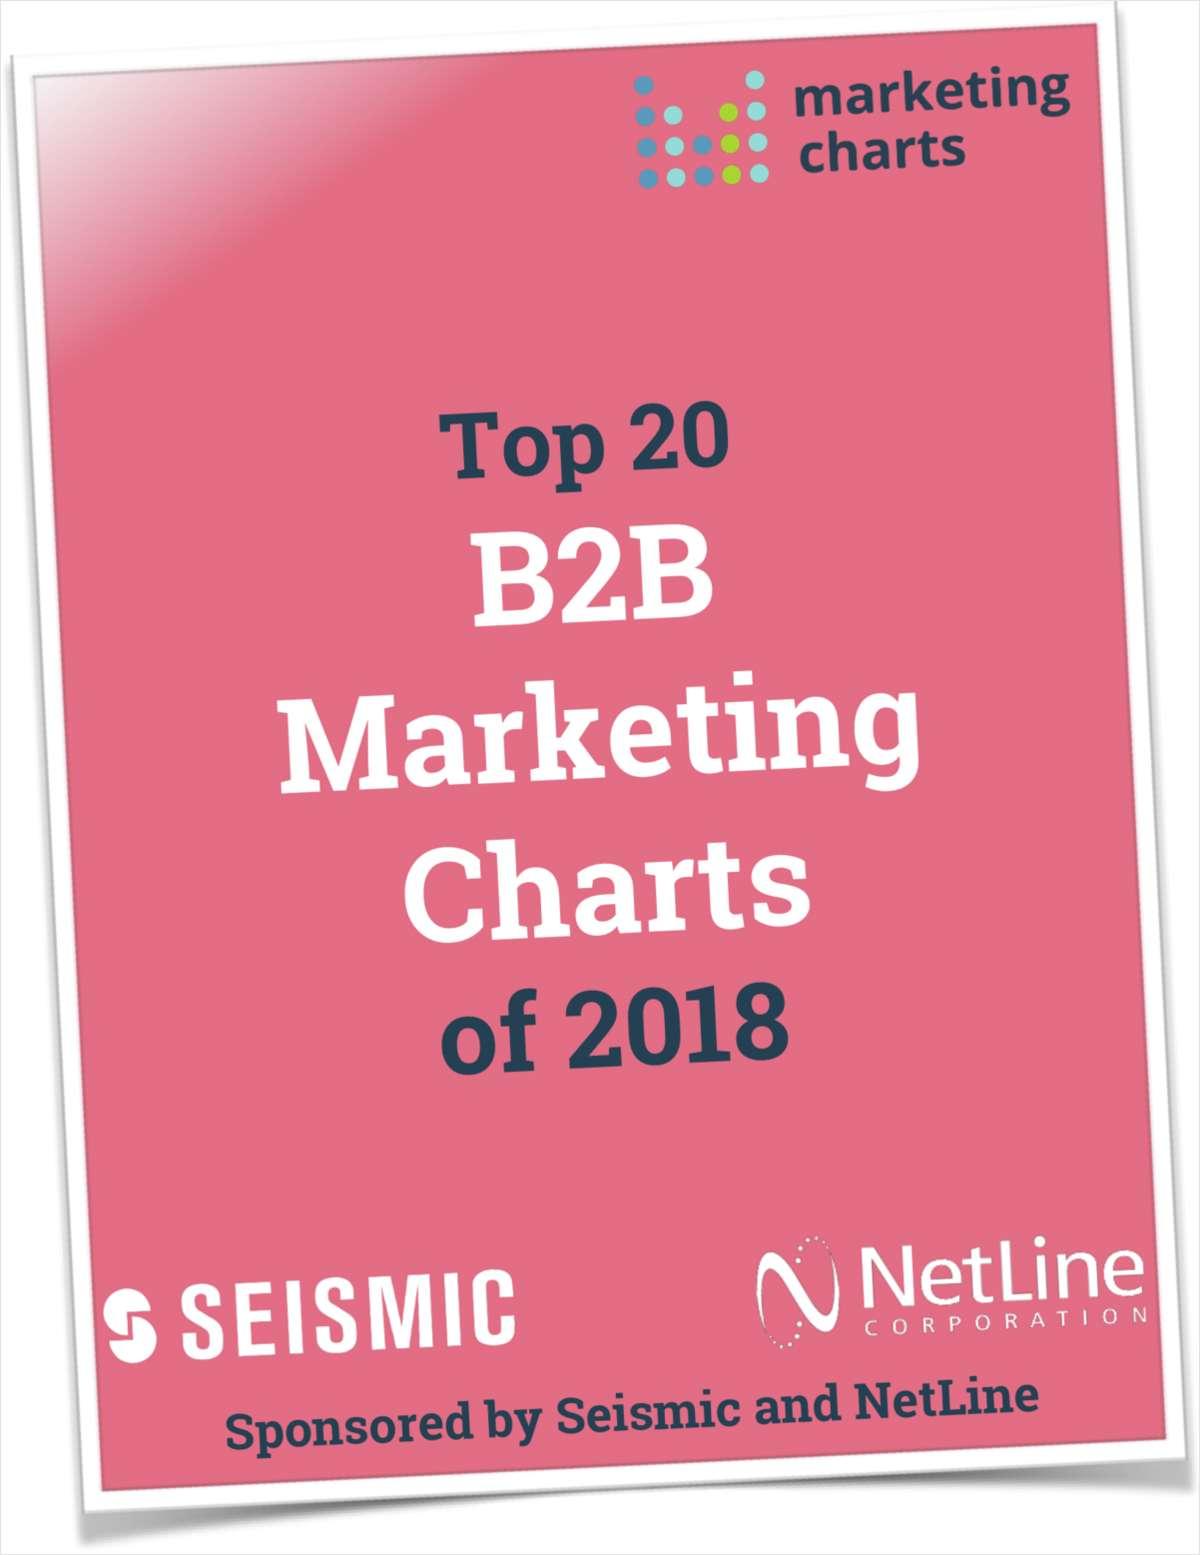 Top 20 B2B Marketing Charts of 2018